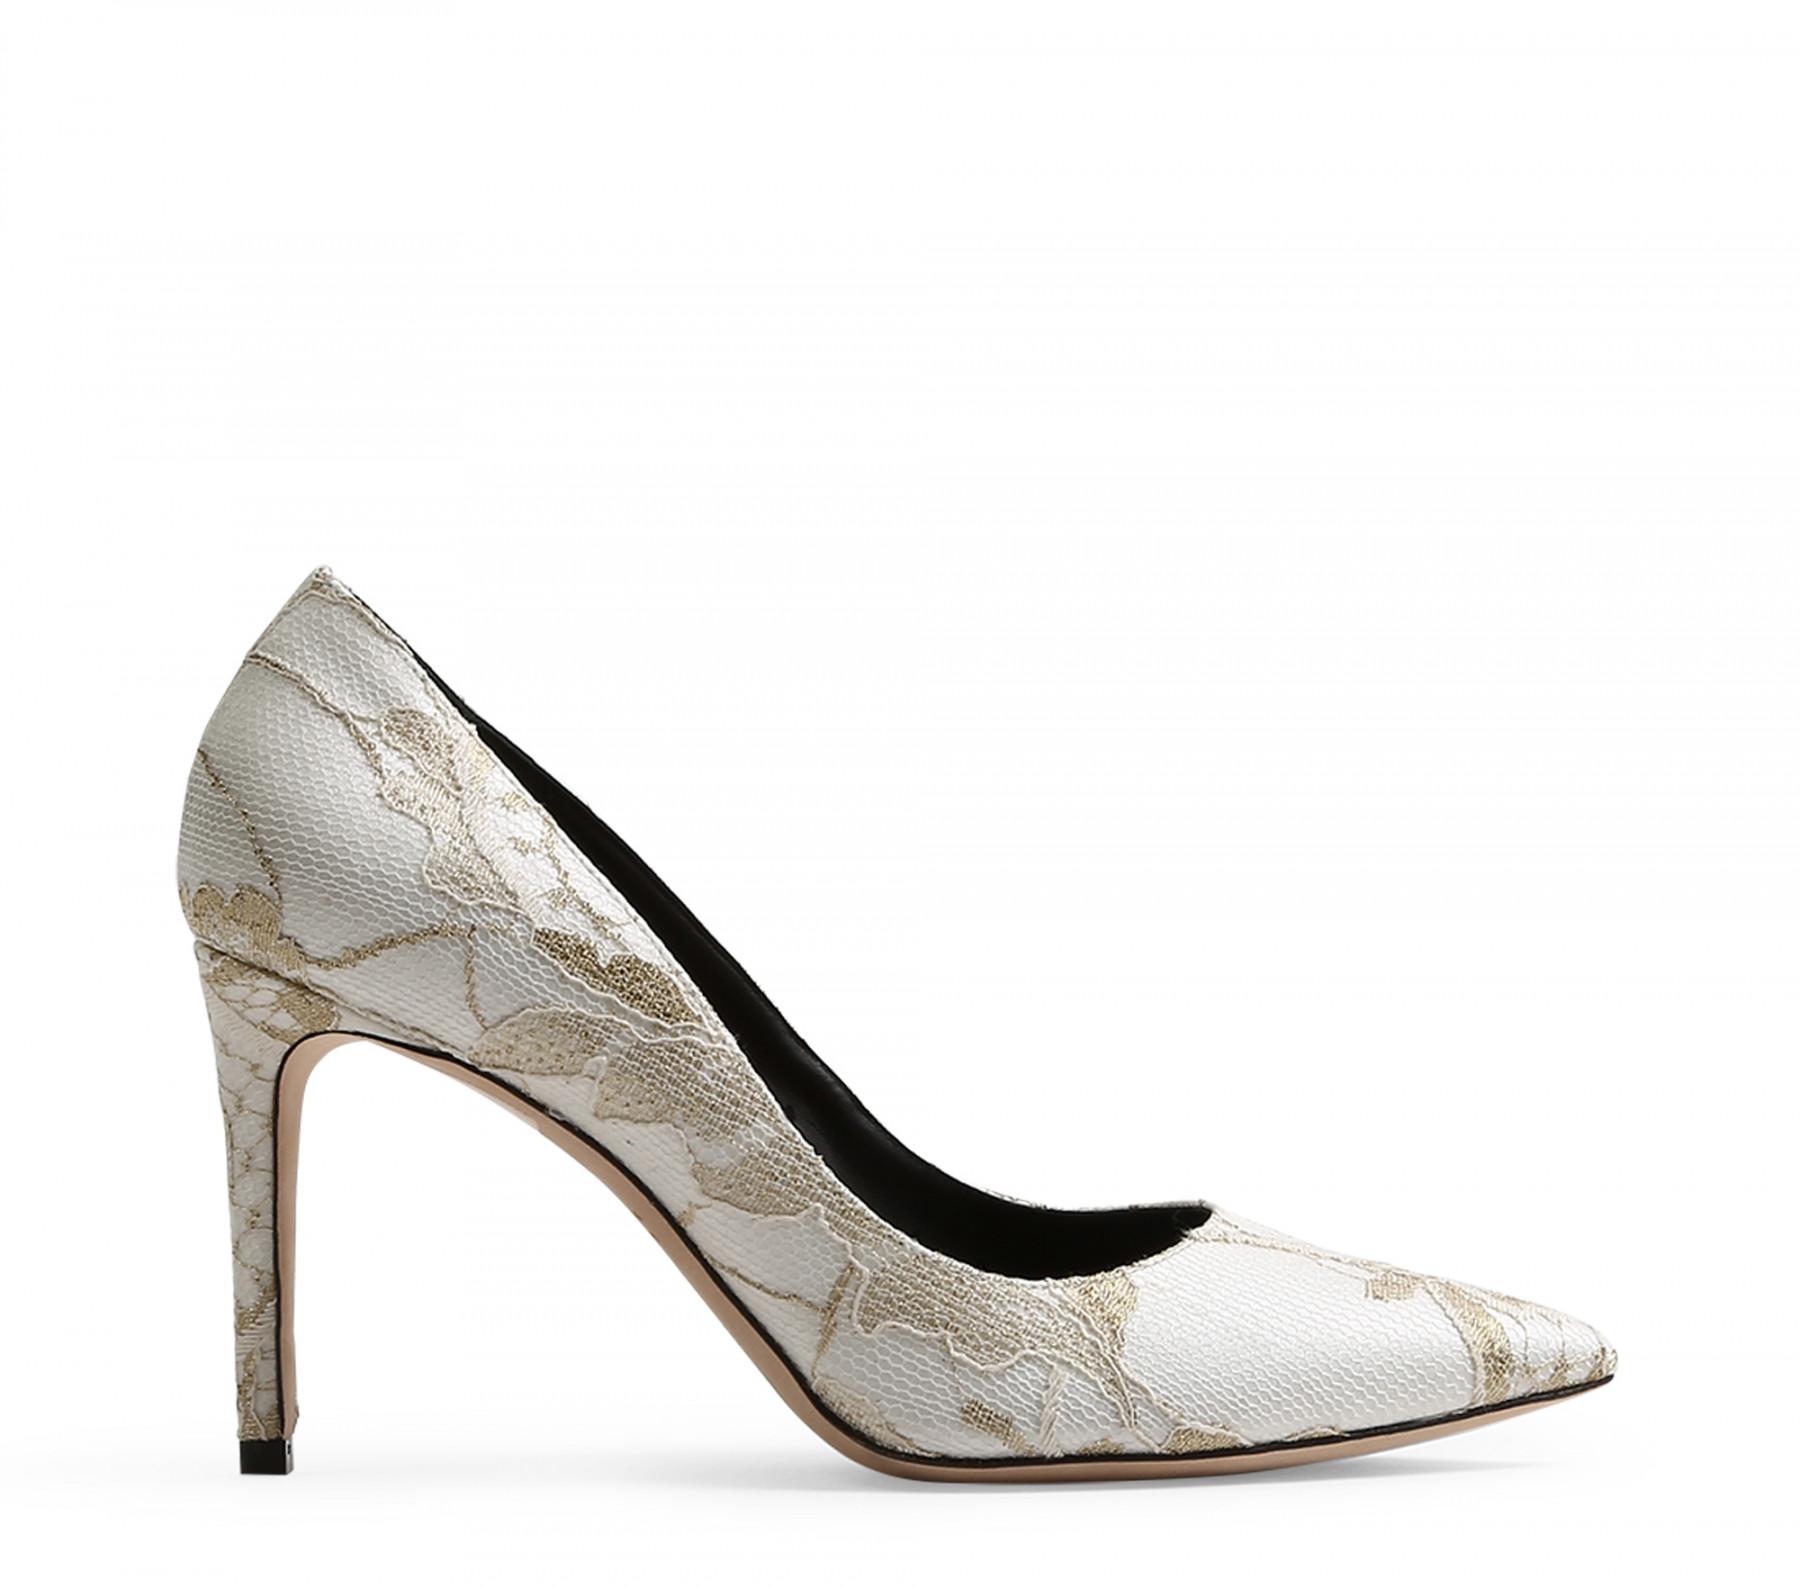 Showcase Pointe Shoes Size